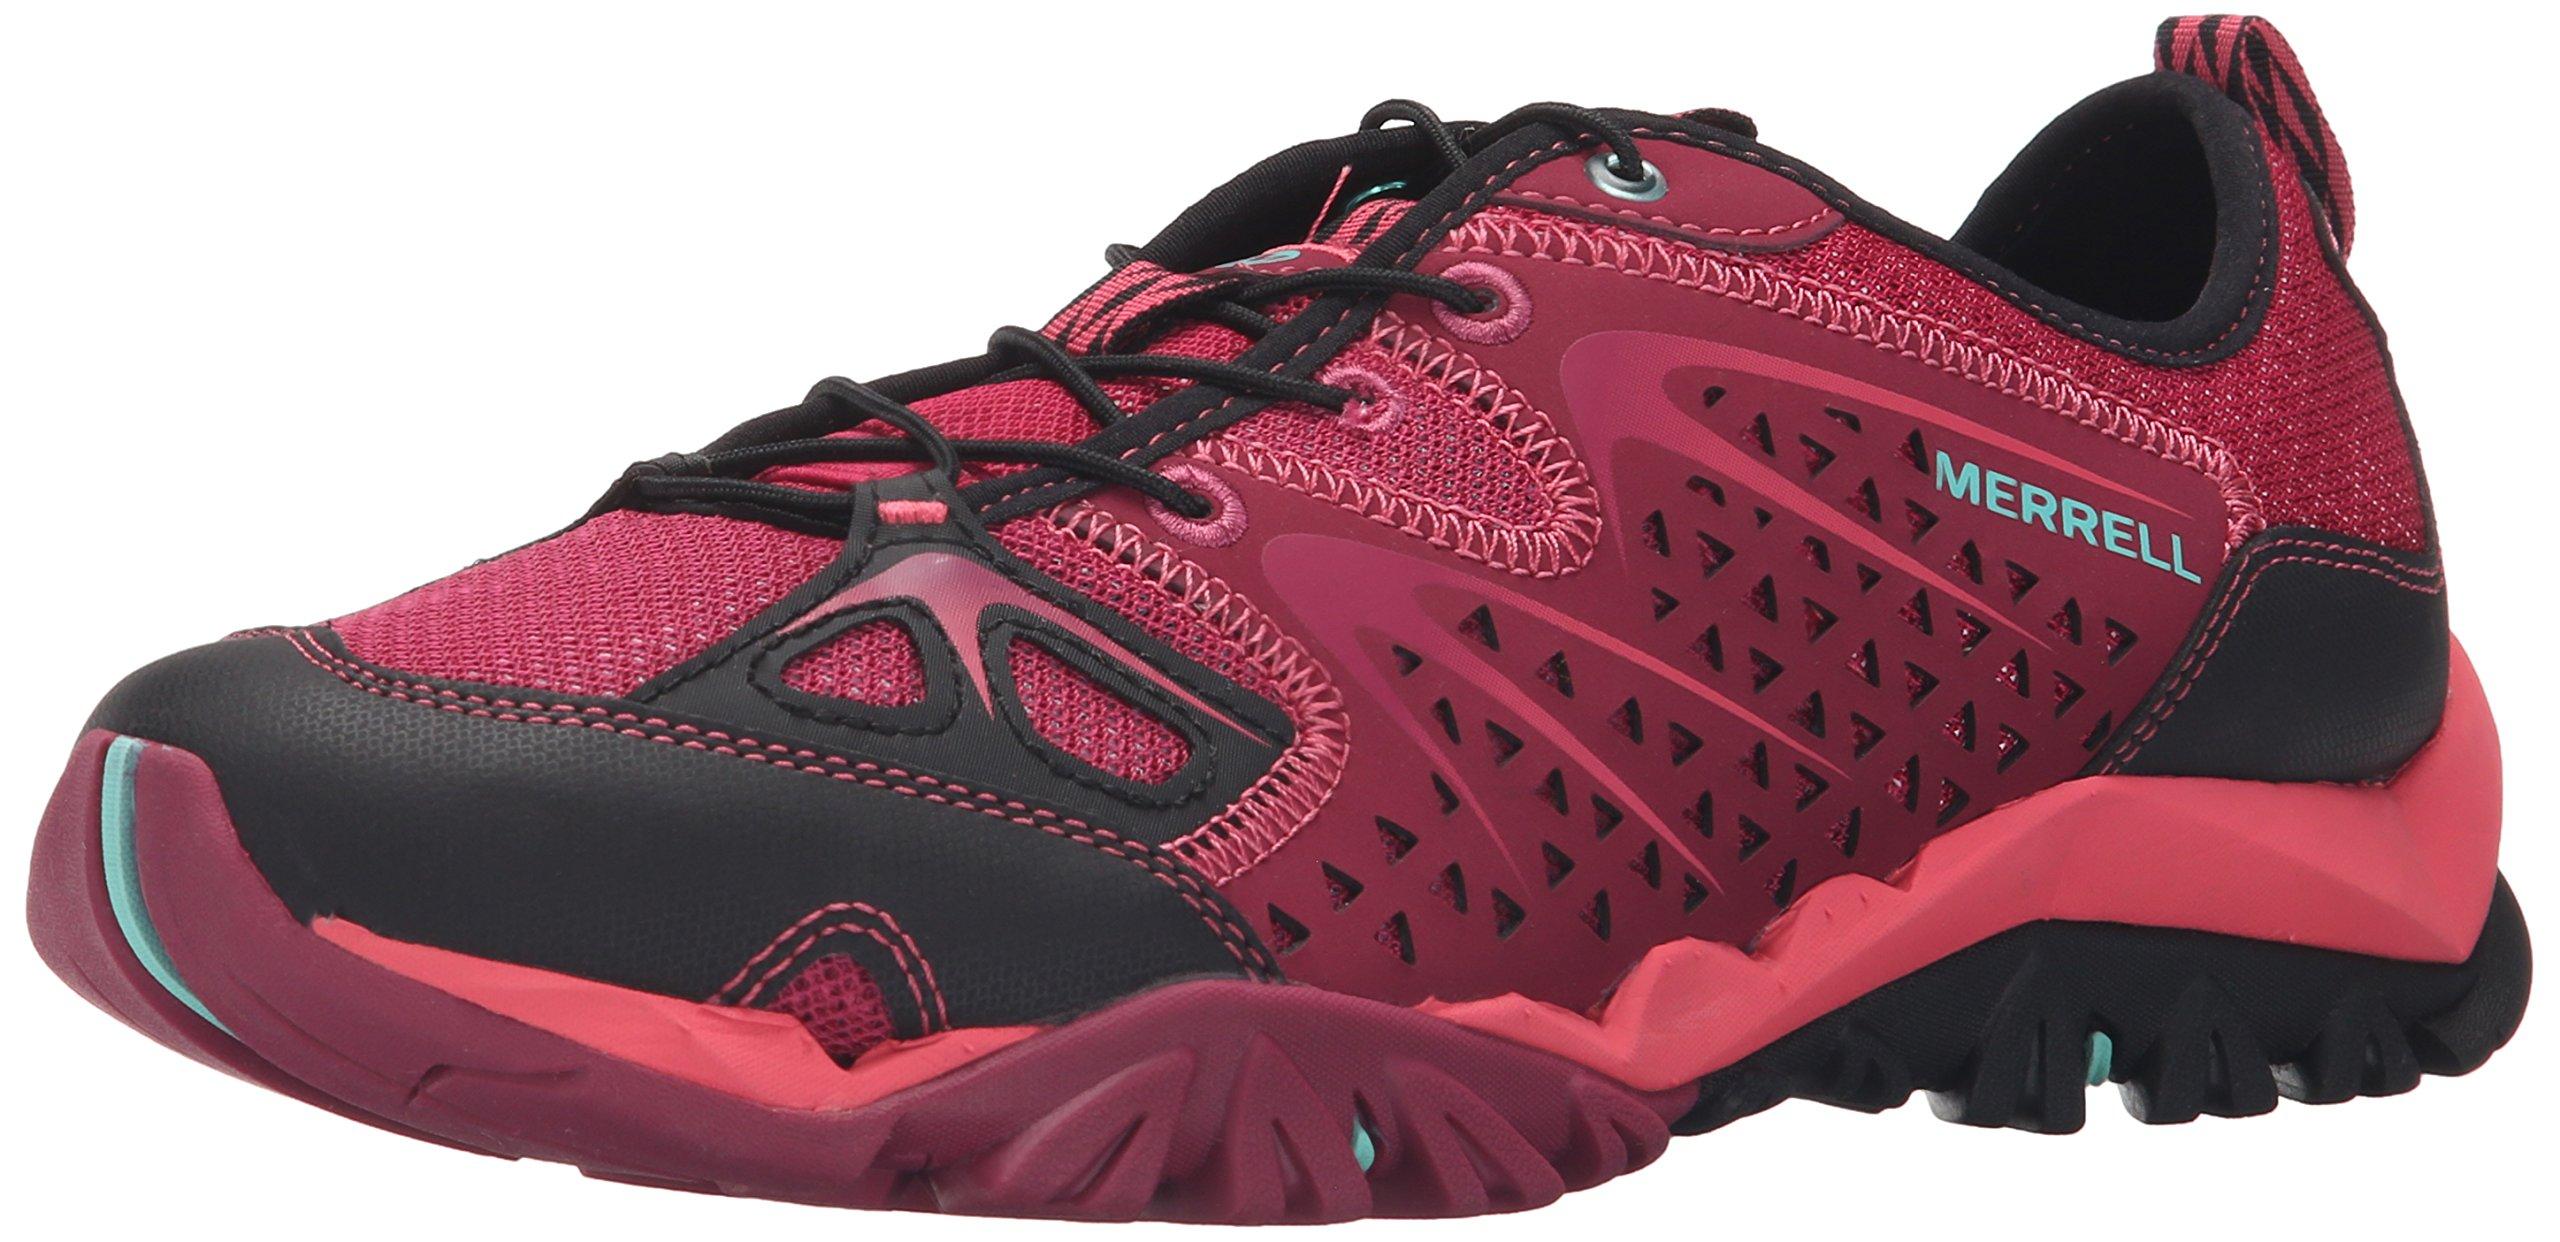 Merrell Women's Capra Rapid Hiking Water Shoe, Bright Red, 7.5 M US